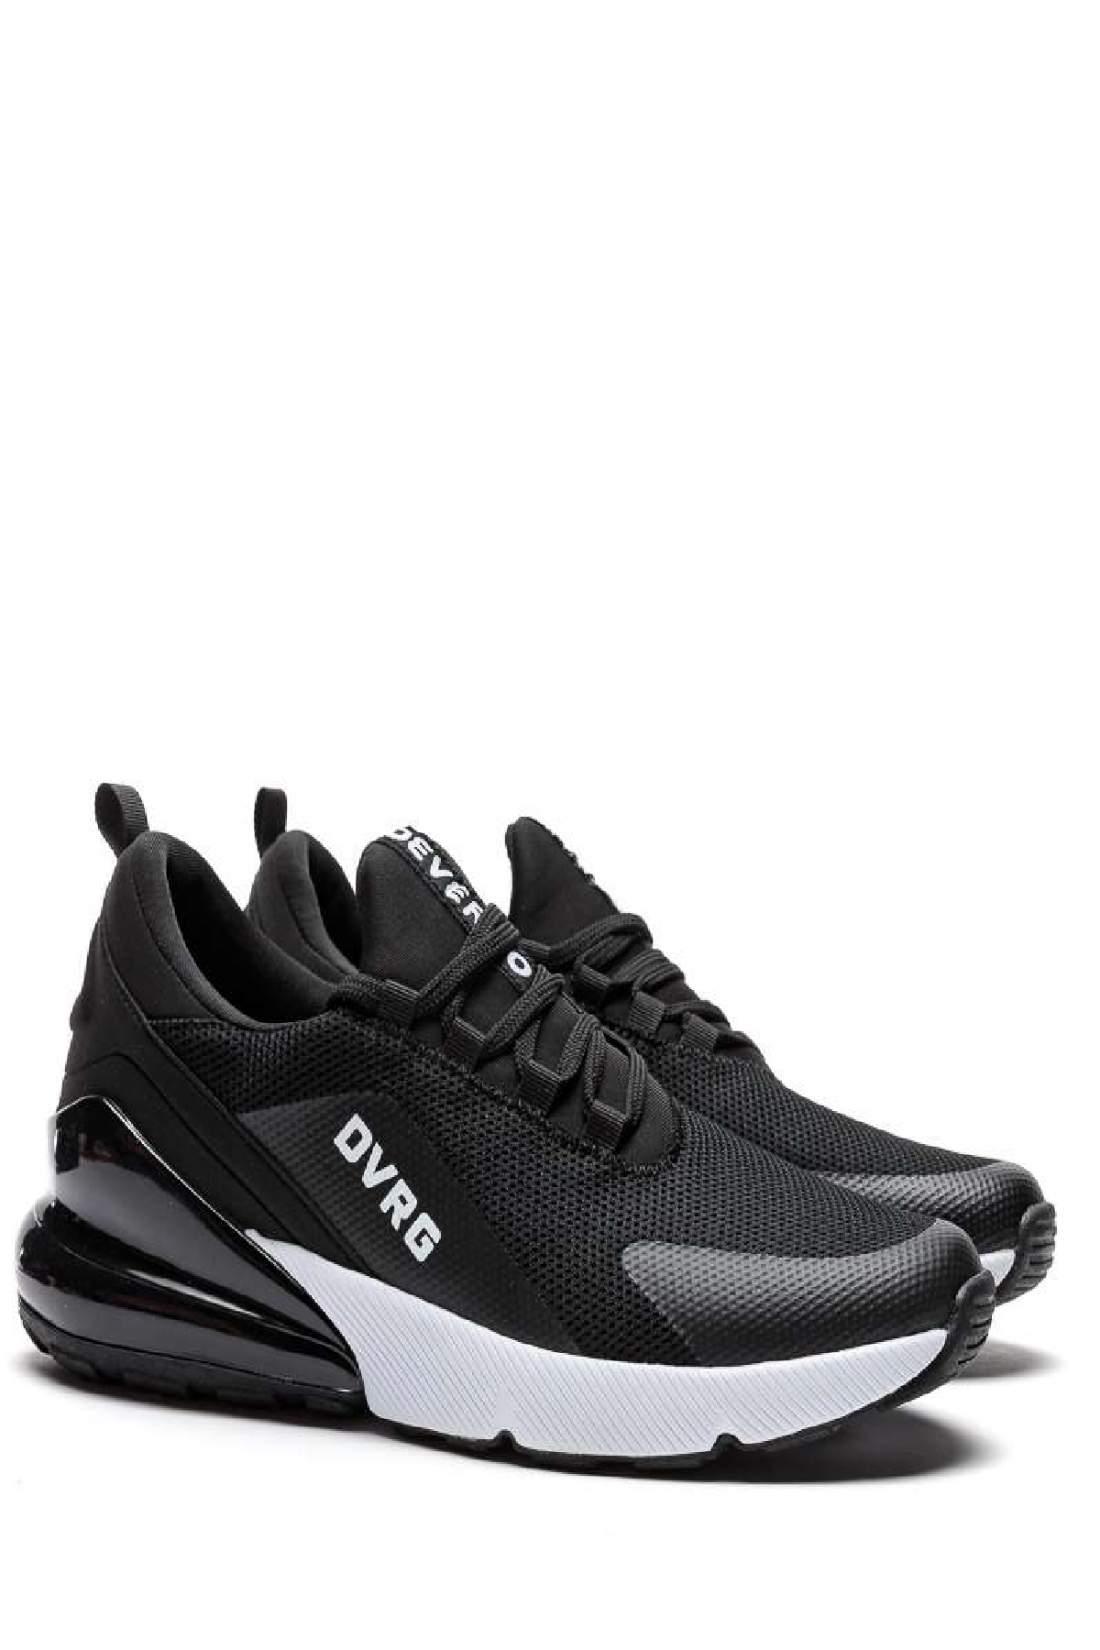 Devergo DELTA férfi sportcipő -Fekete